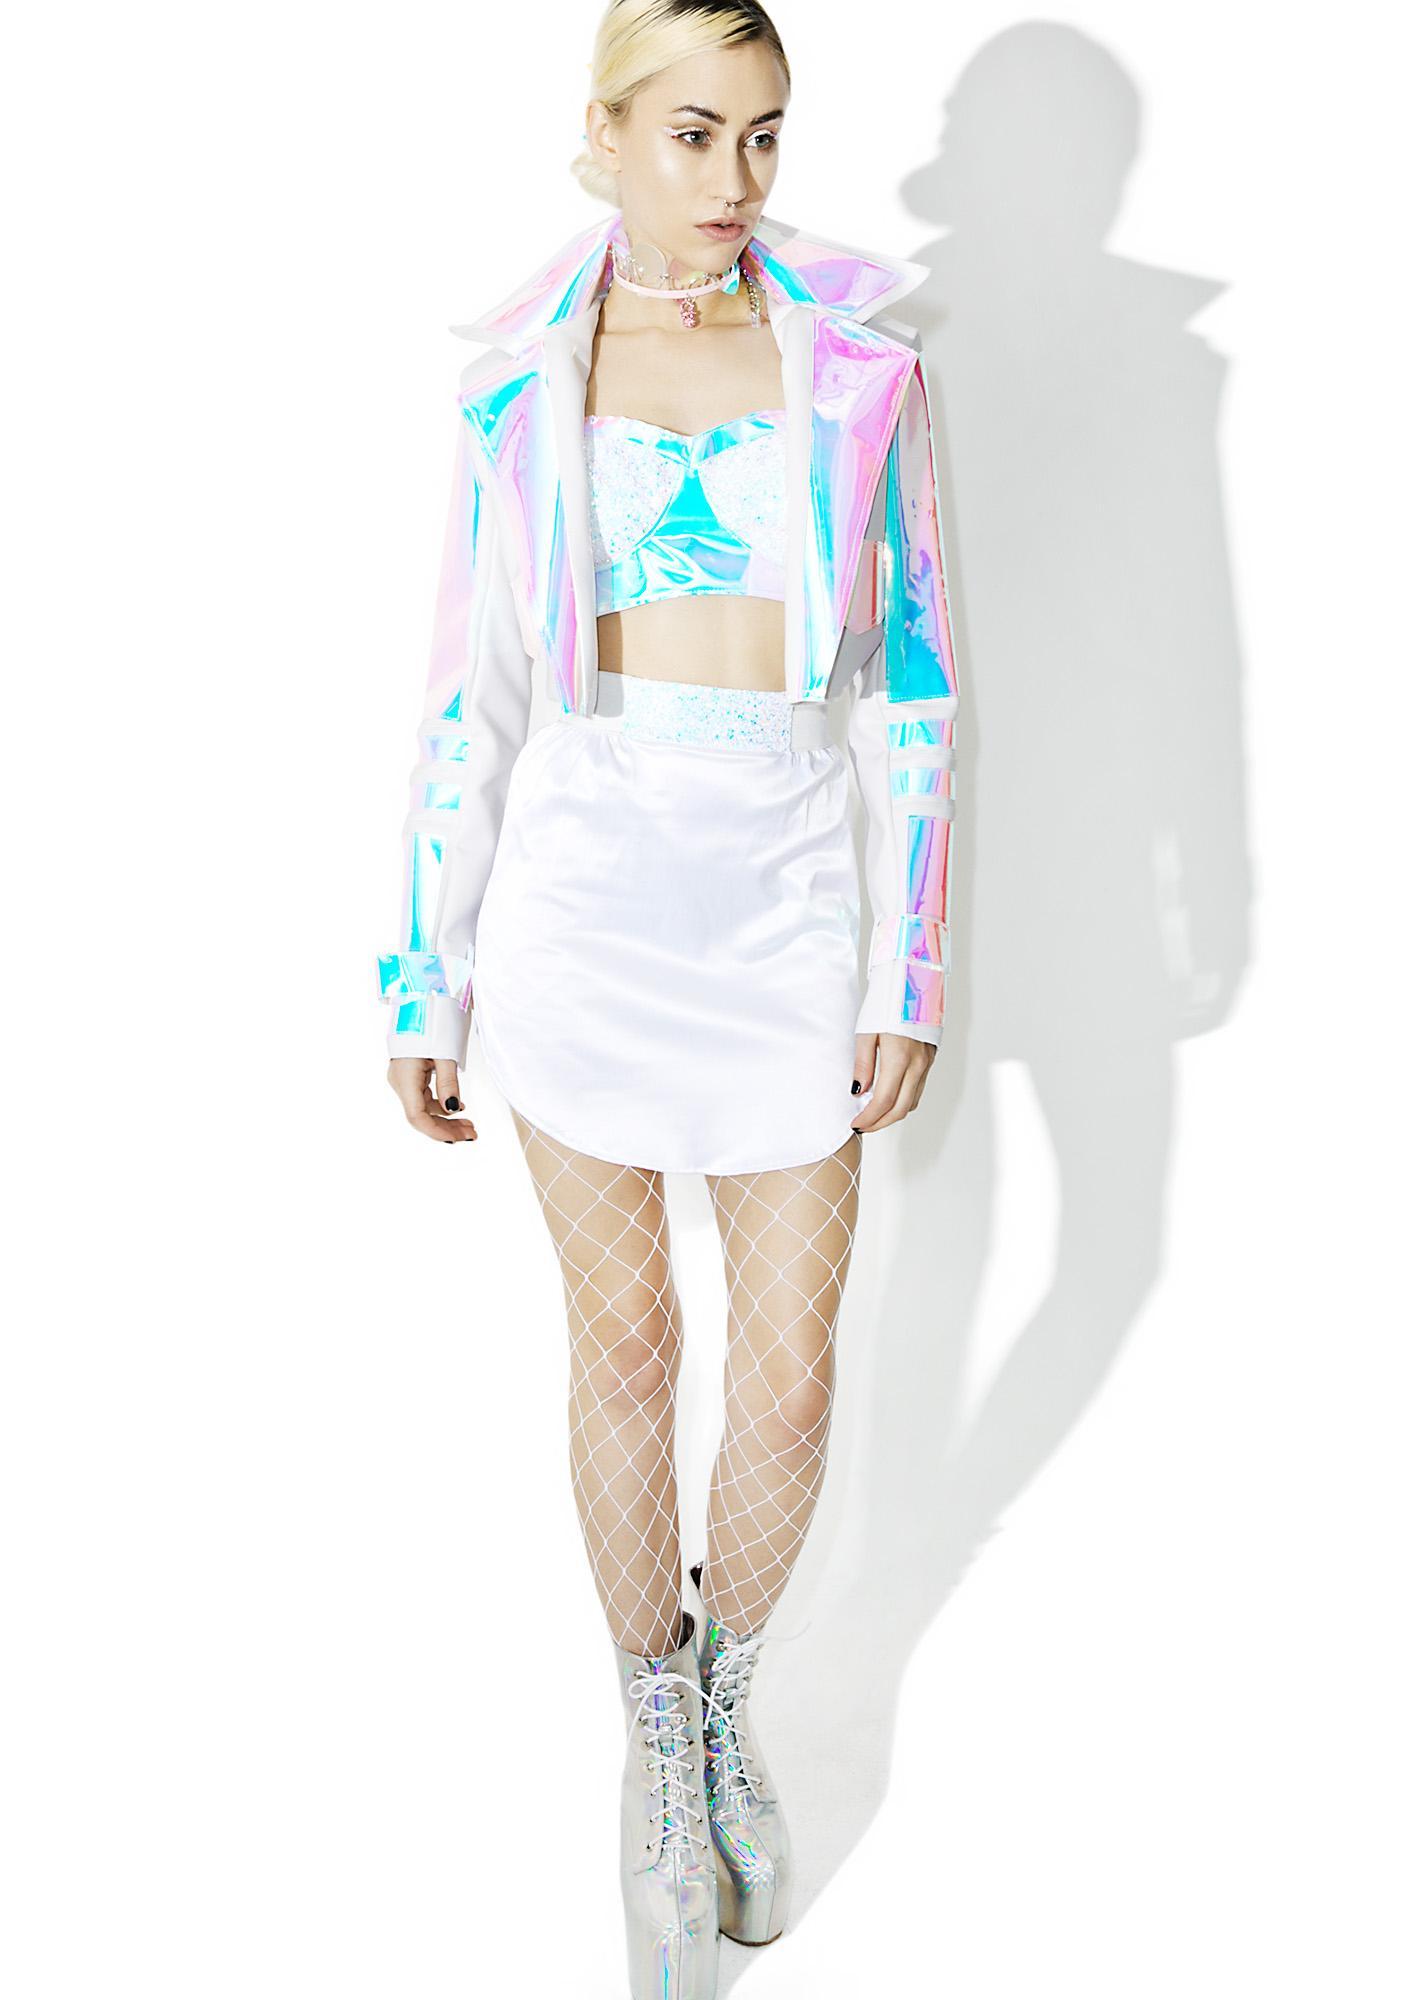 ESQAPE Extreme Sparkle Skirt